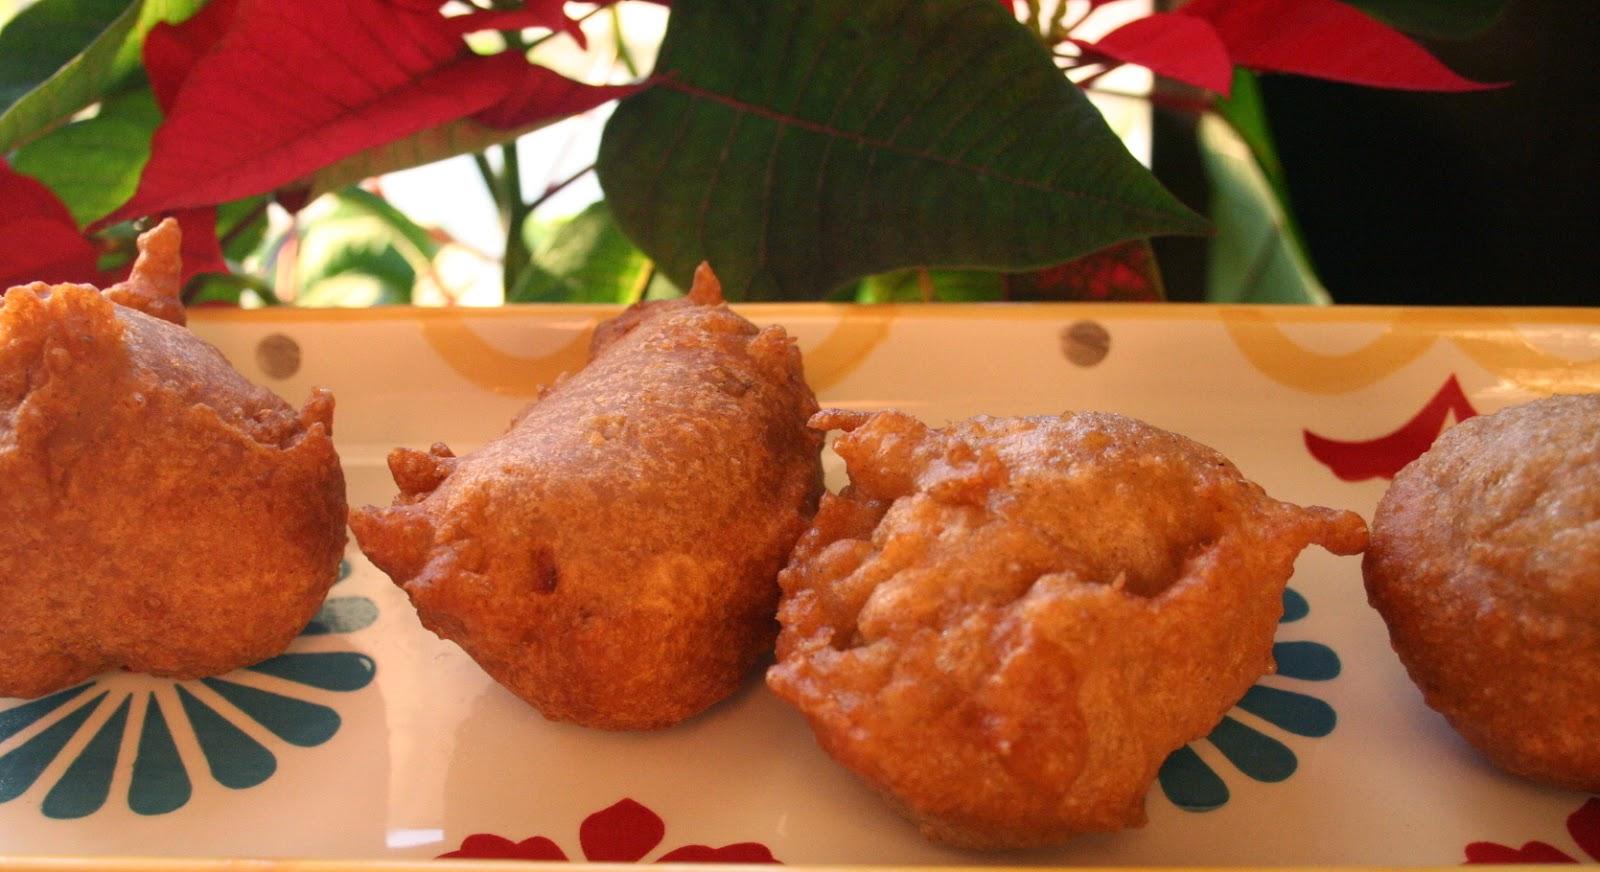 The Healthy Happy Wife Oliebollen Dutch Doughnut Gluten Refined Sugar And Yeast Free